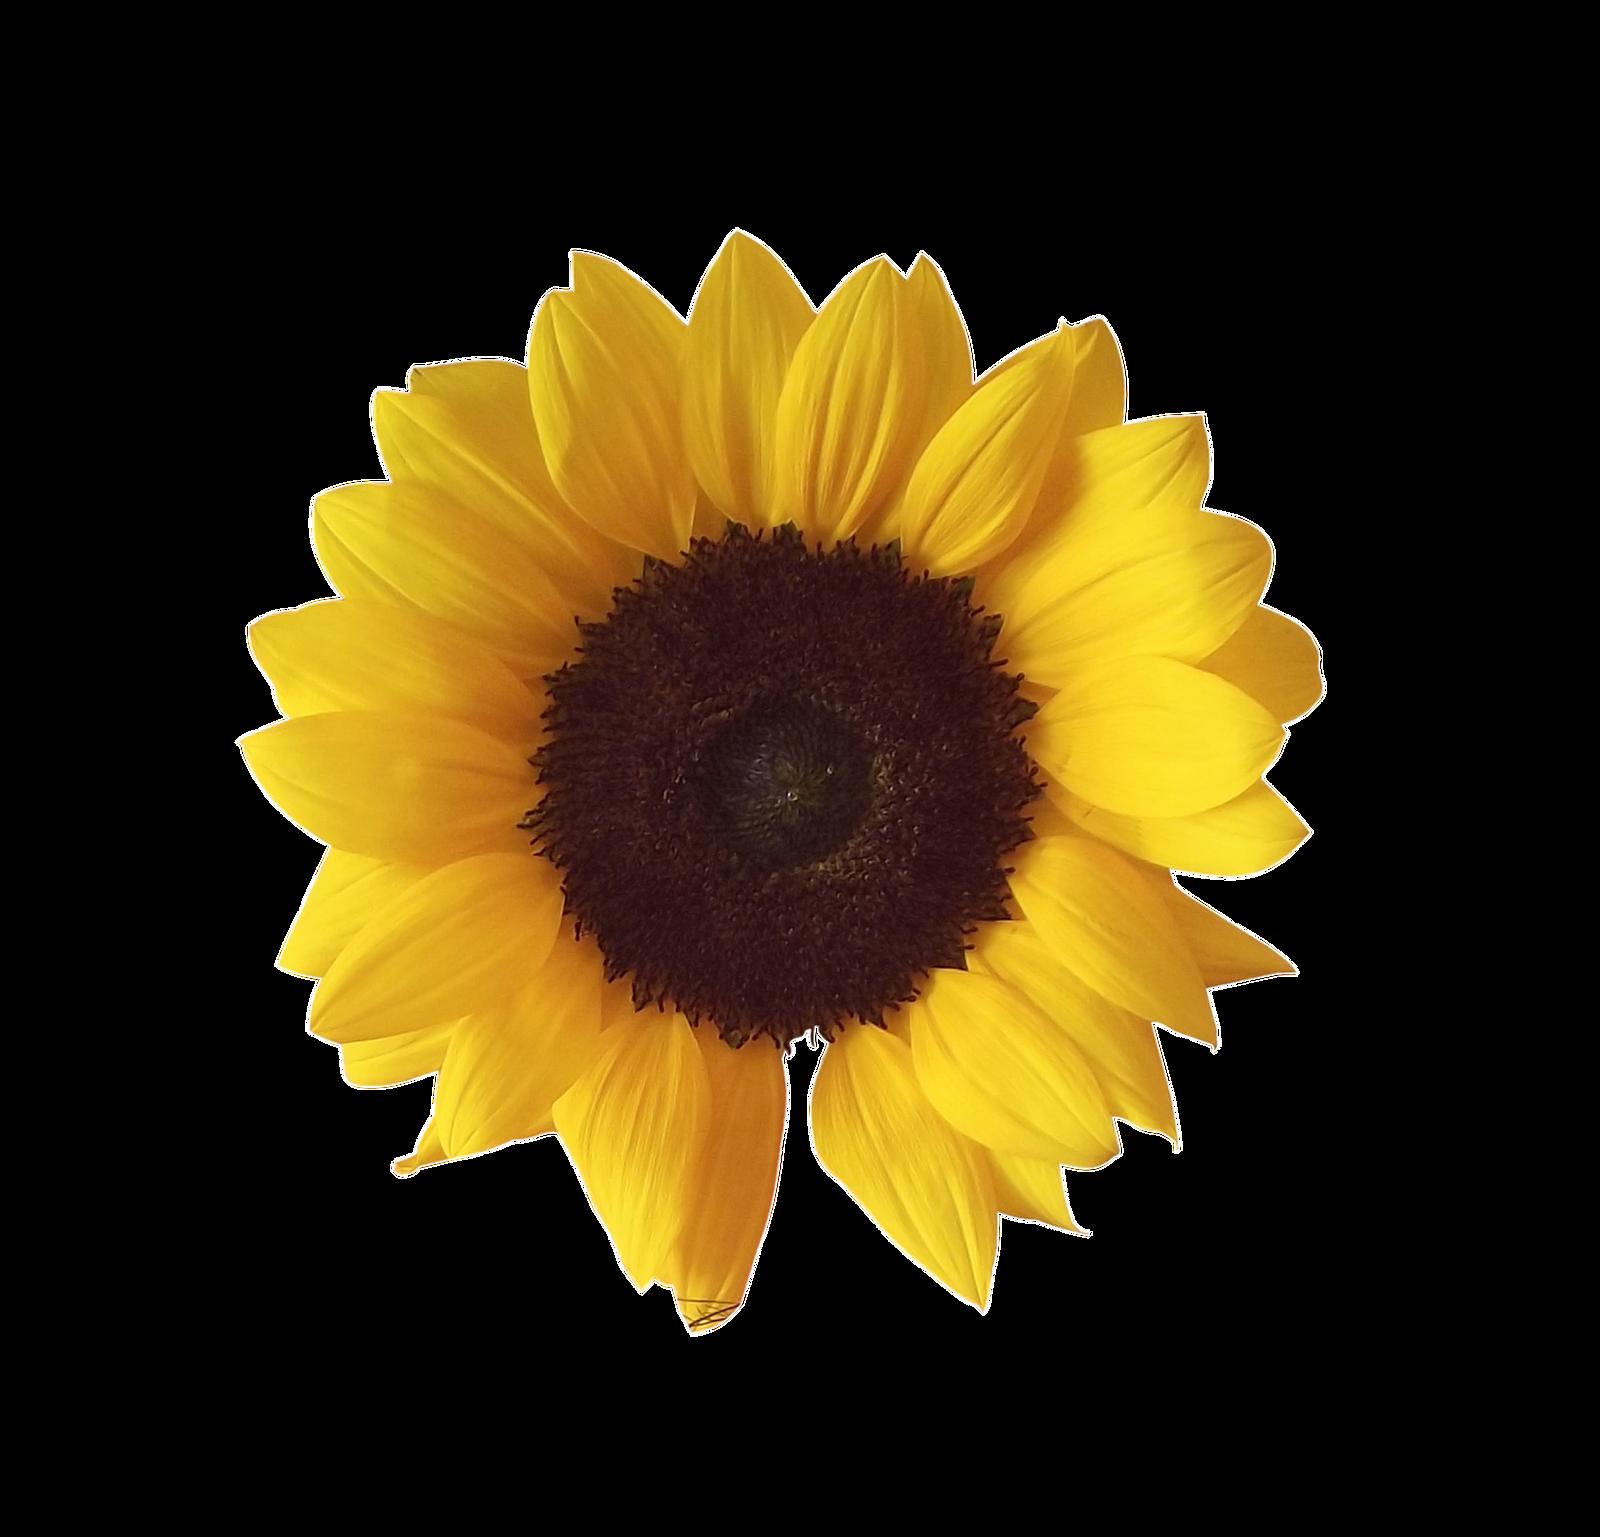 Sunflower Frame Png Sunflower Png by Adagem